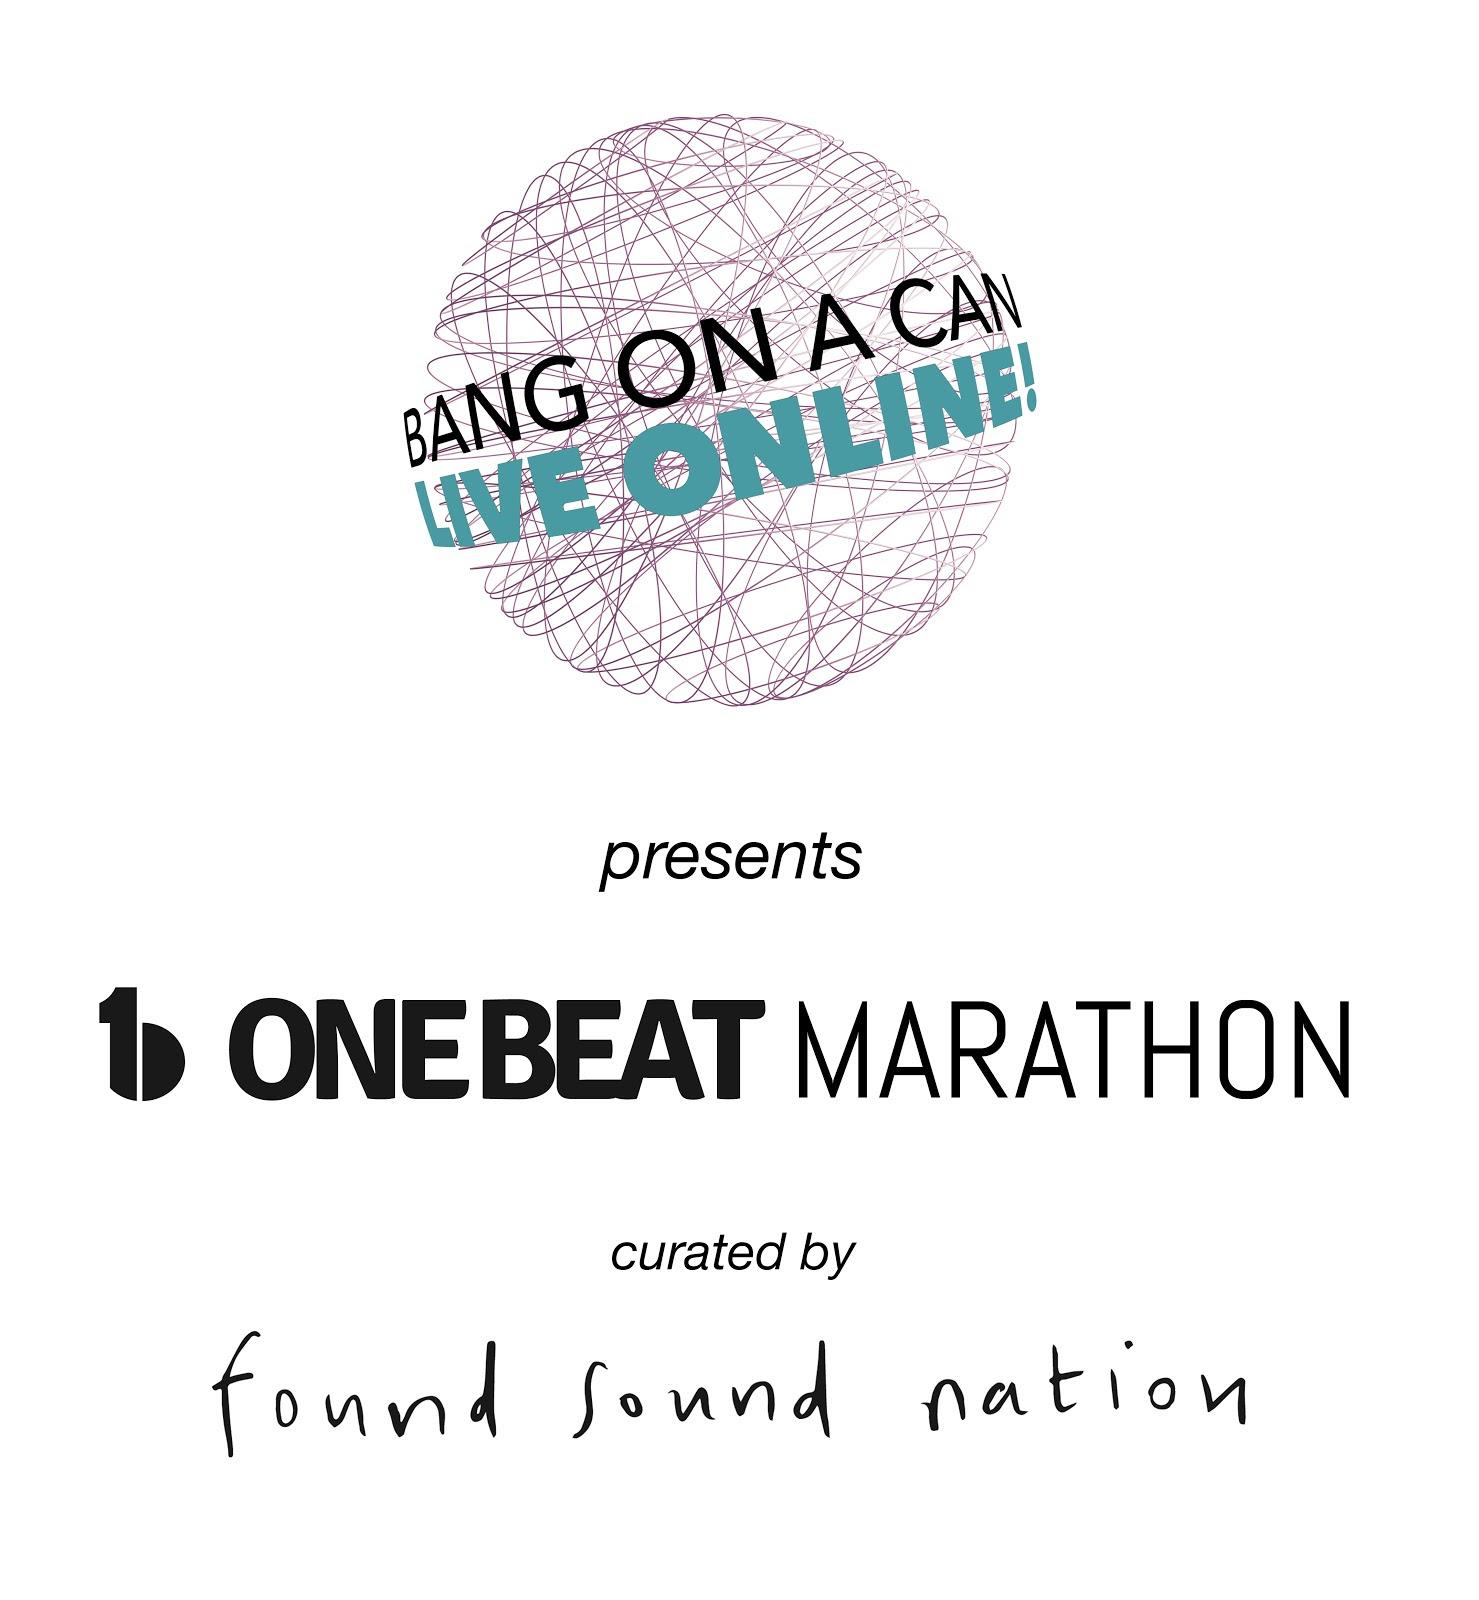 BOAC_OneBeatMarathon.jpg